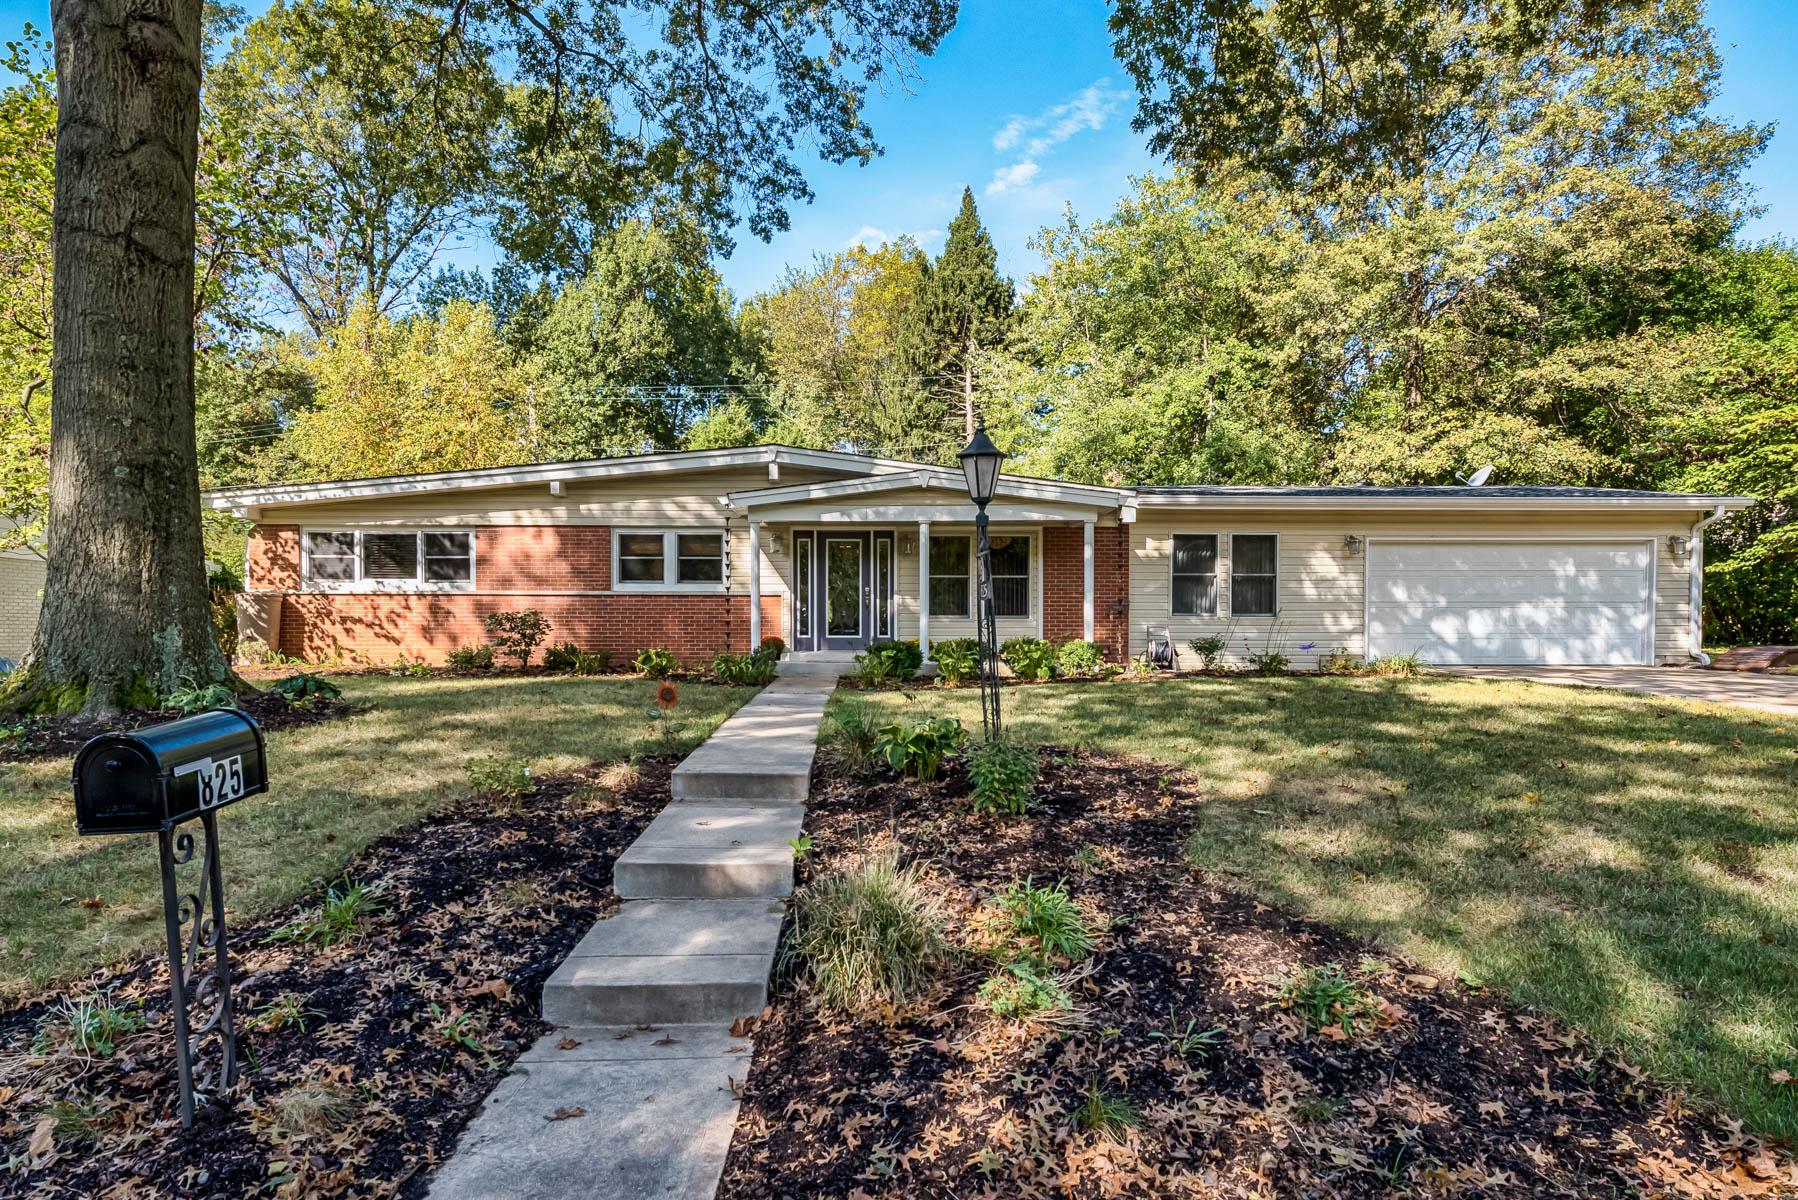 Villa per Vendita alle ore Louwen 825 Louwen Ladue, Missouri 63124 Stati Uniti